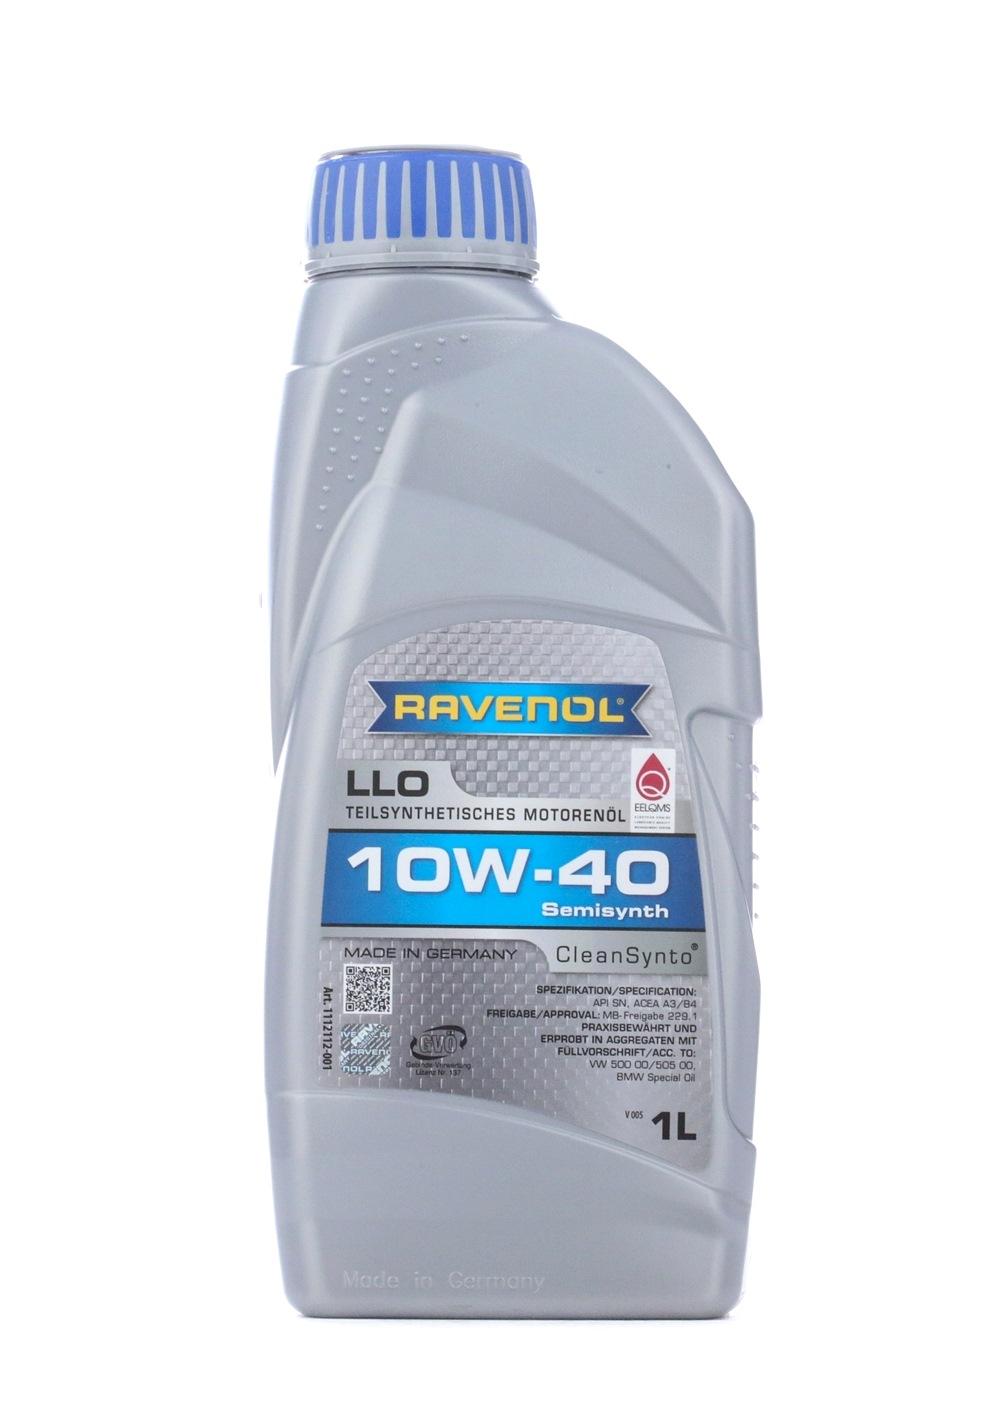 1112112-001-01-999 RAVENOL LLO 10W-40, 1l, Teilsynthetiköl Motoröl 1112112-001-01-999 günstig kaufen